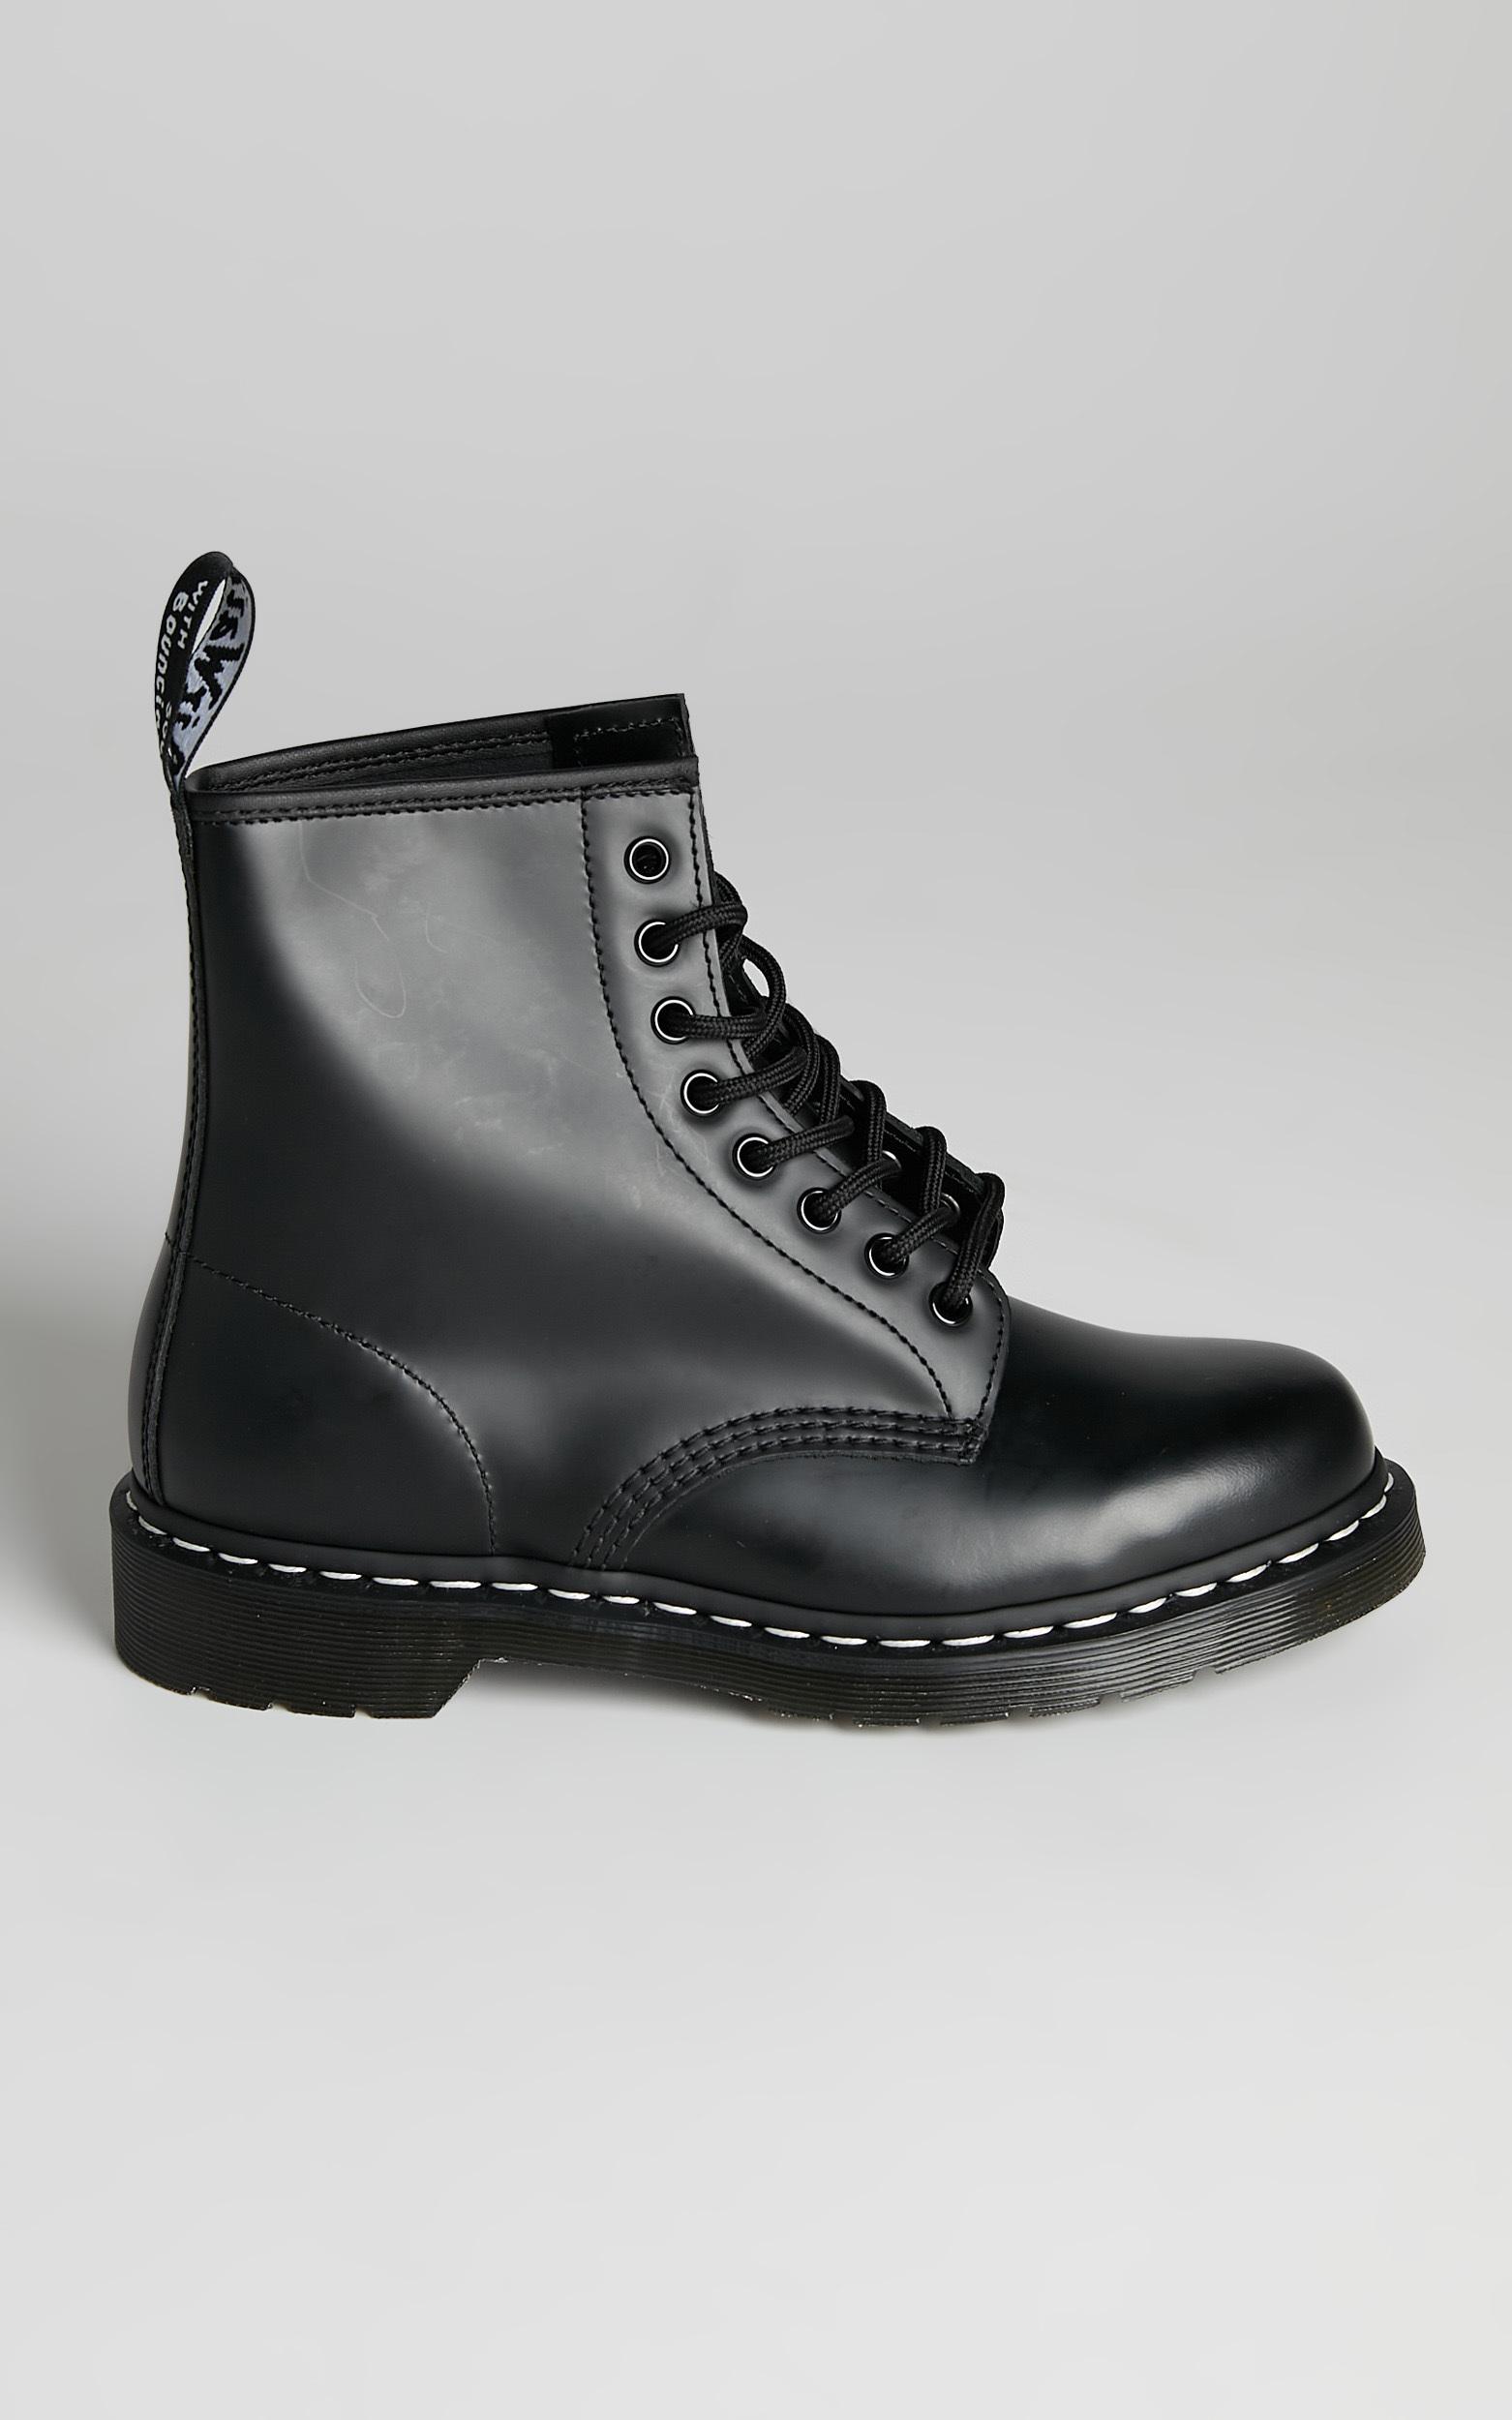 Dr. Martens - 1460 WS 8 Eye Boot in Black Smooth - 05, BLK1, hi-res image number null